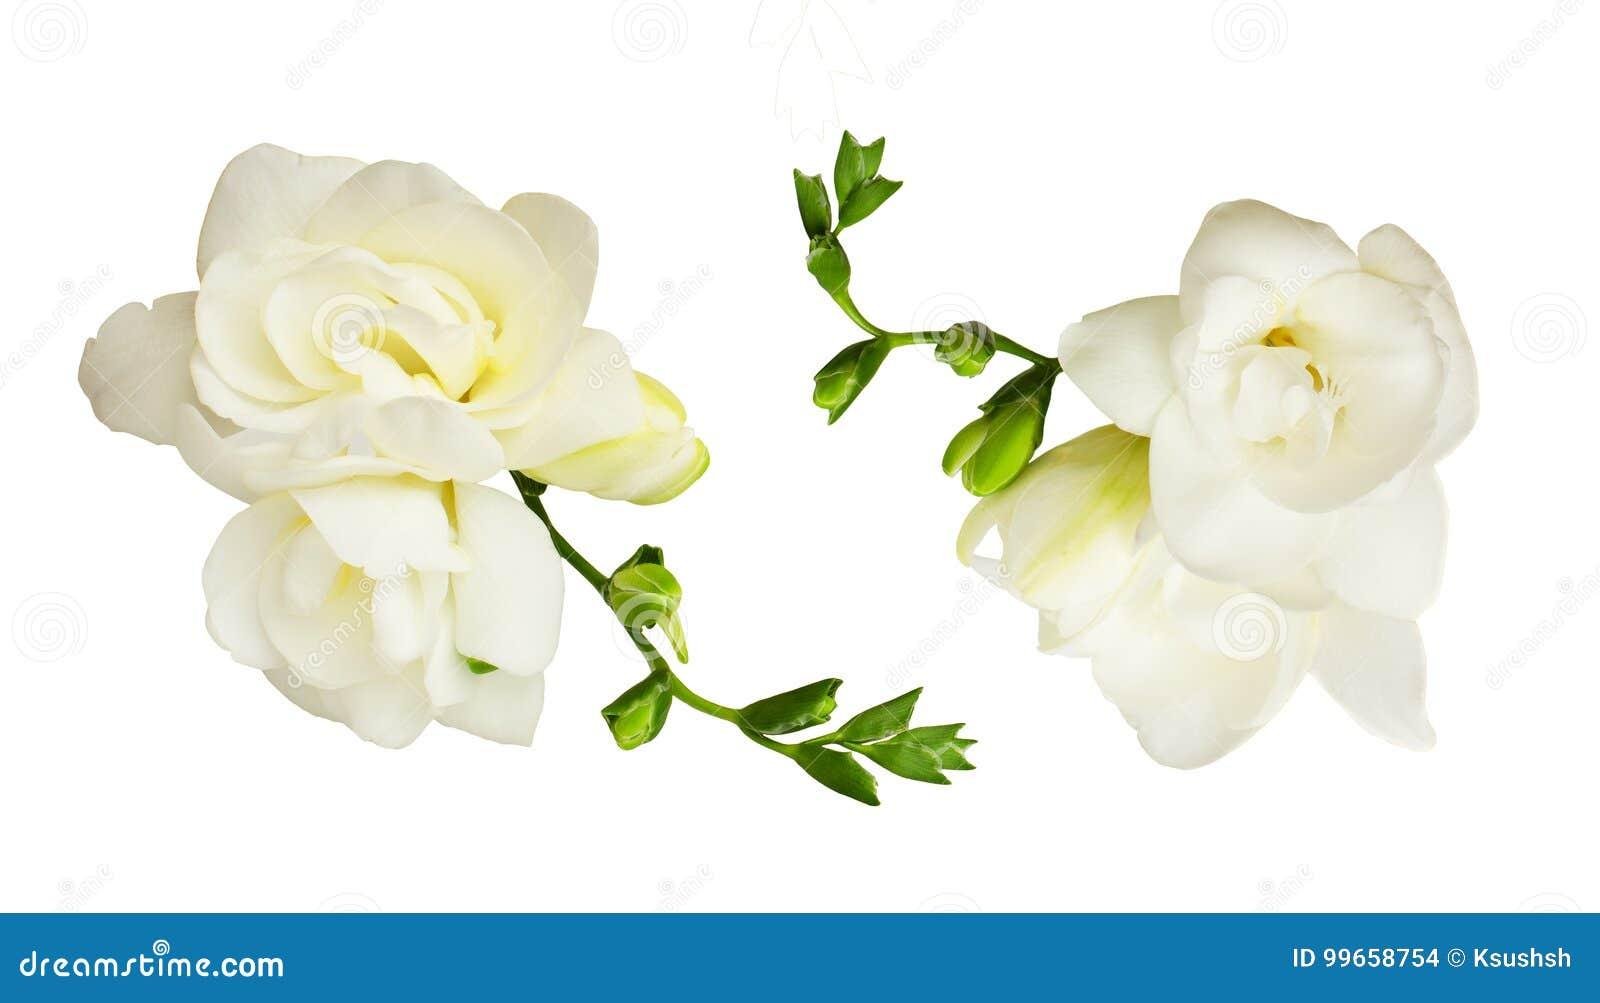 Set of white freesia flowers stock photo image of fresh freesia download comp mightylinksfo